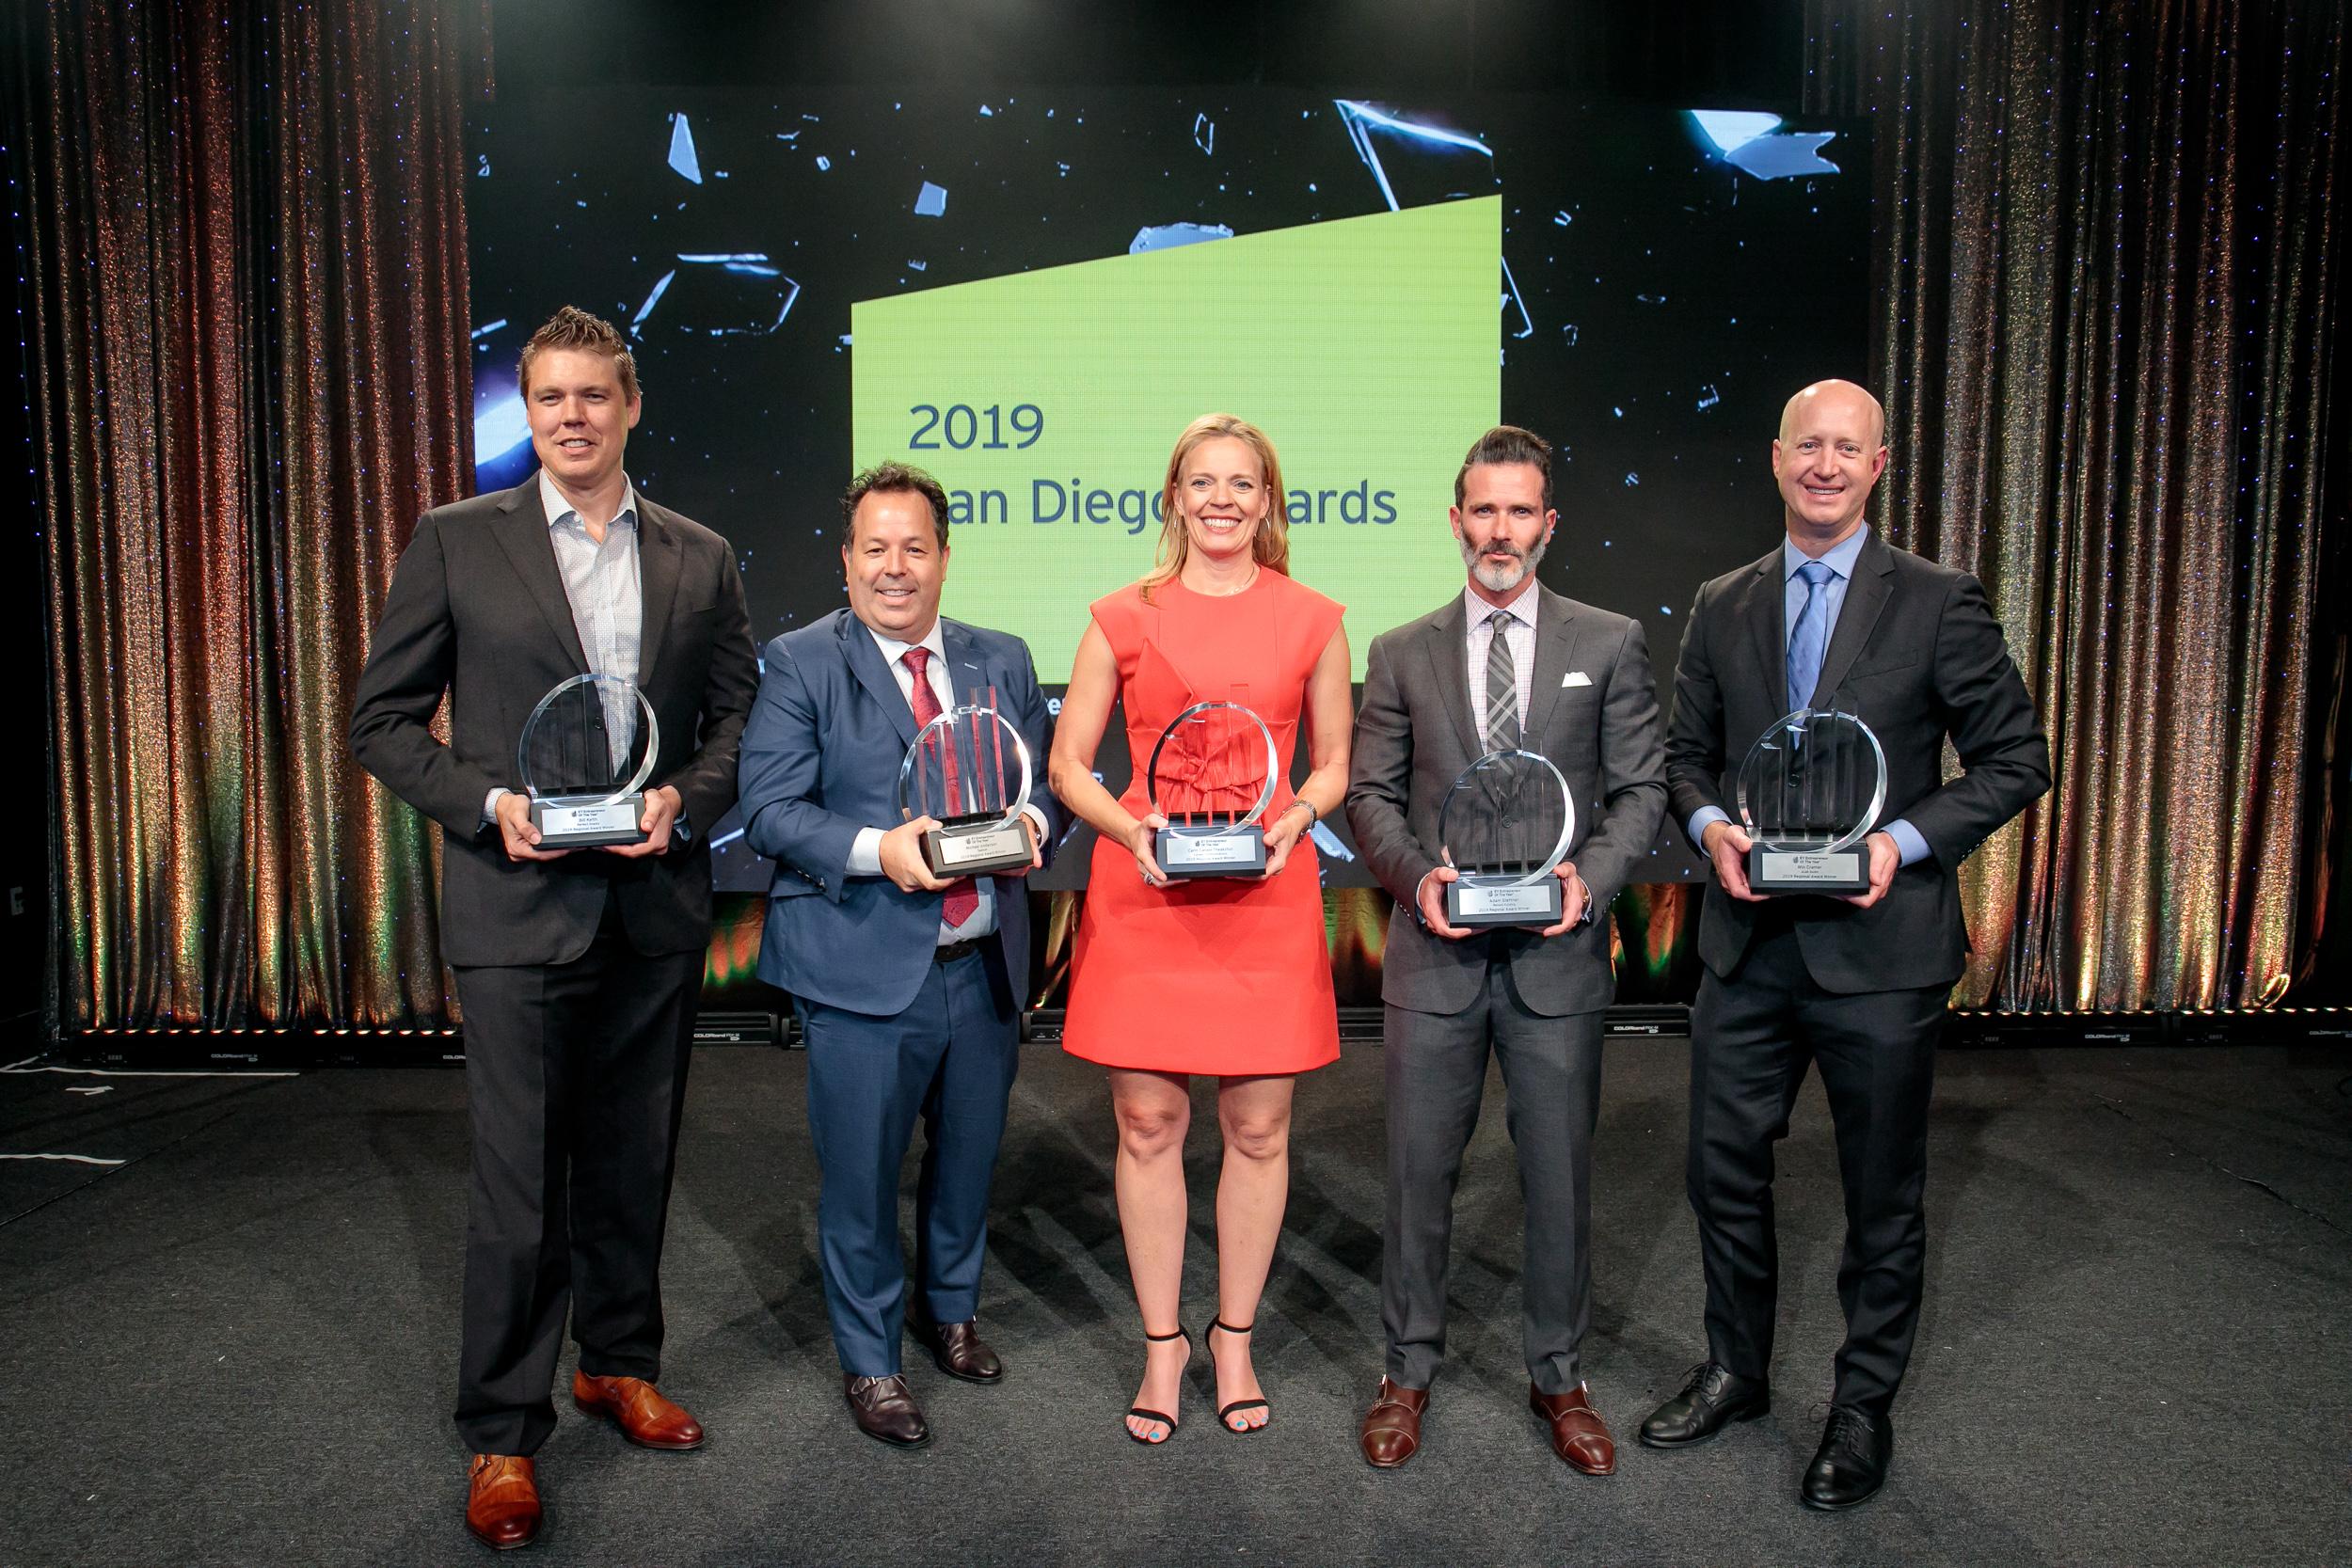 2019 san diego award